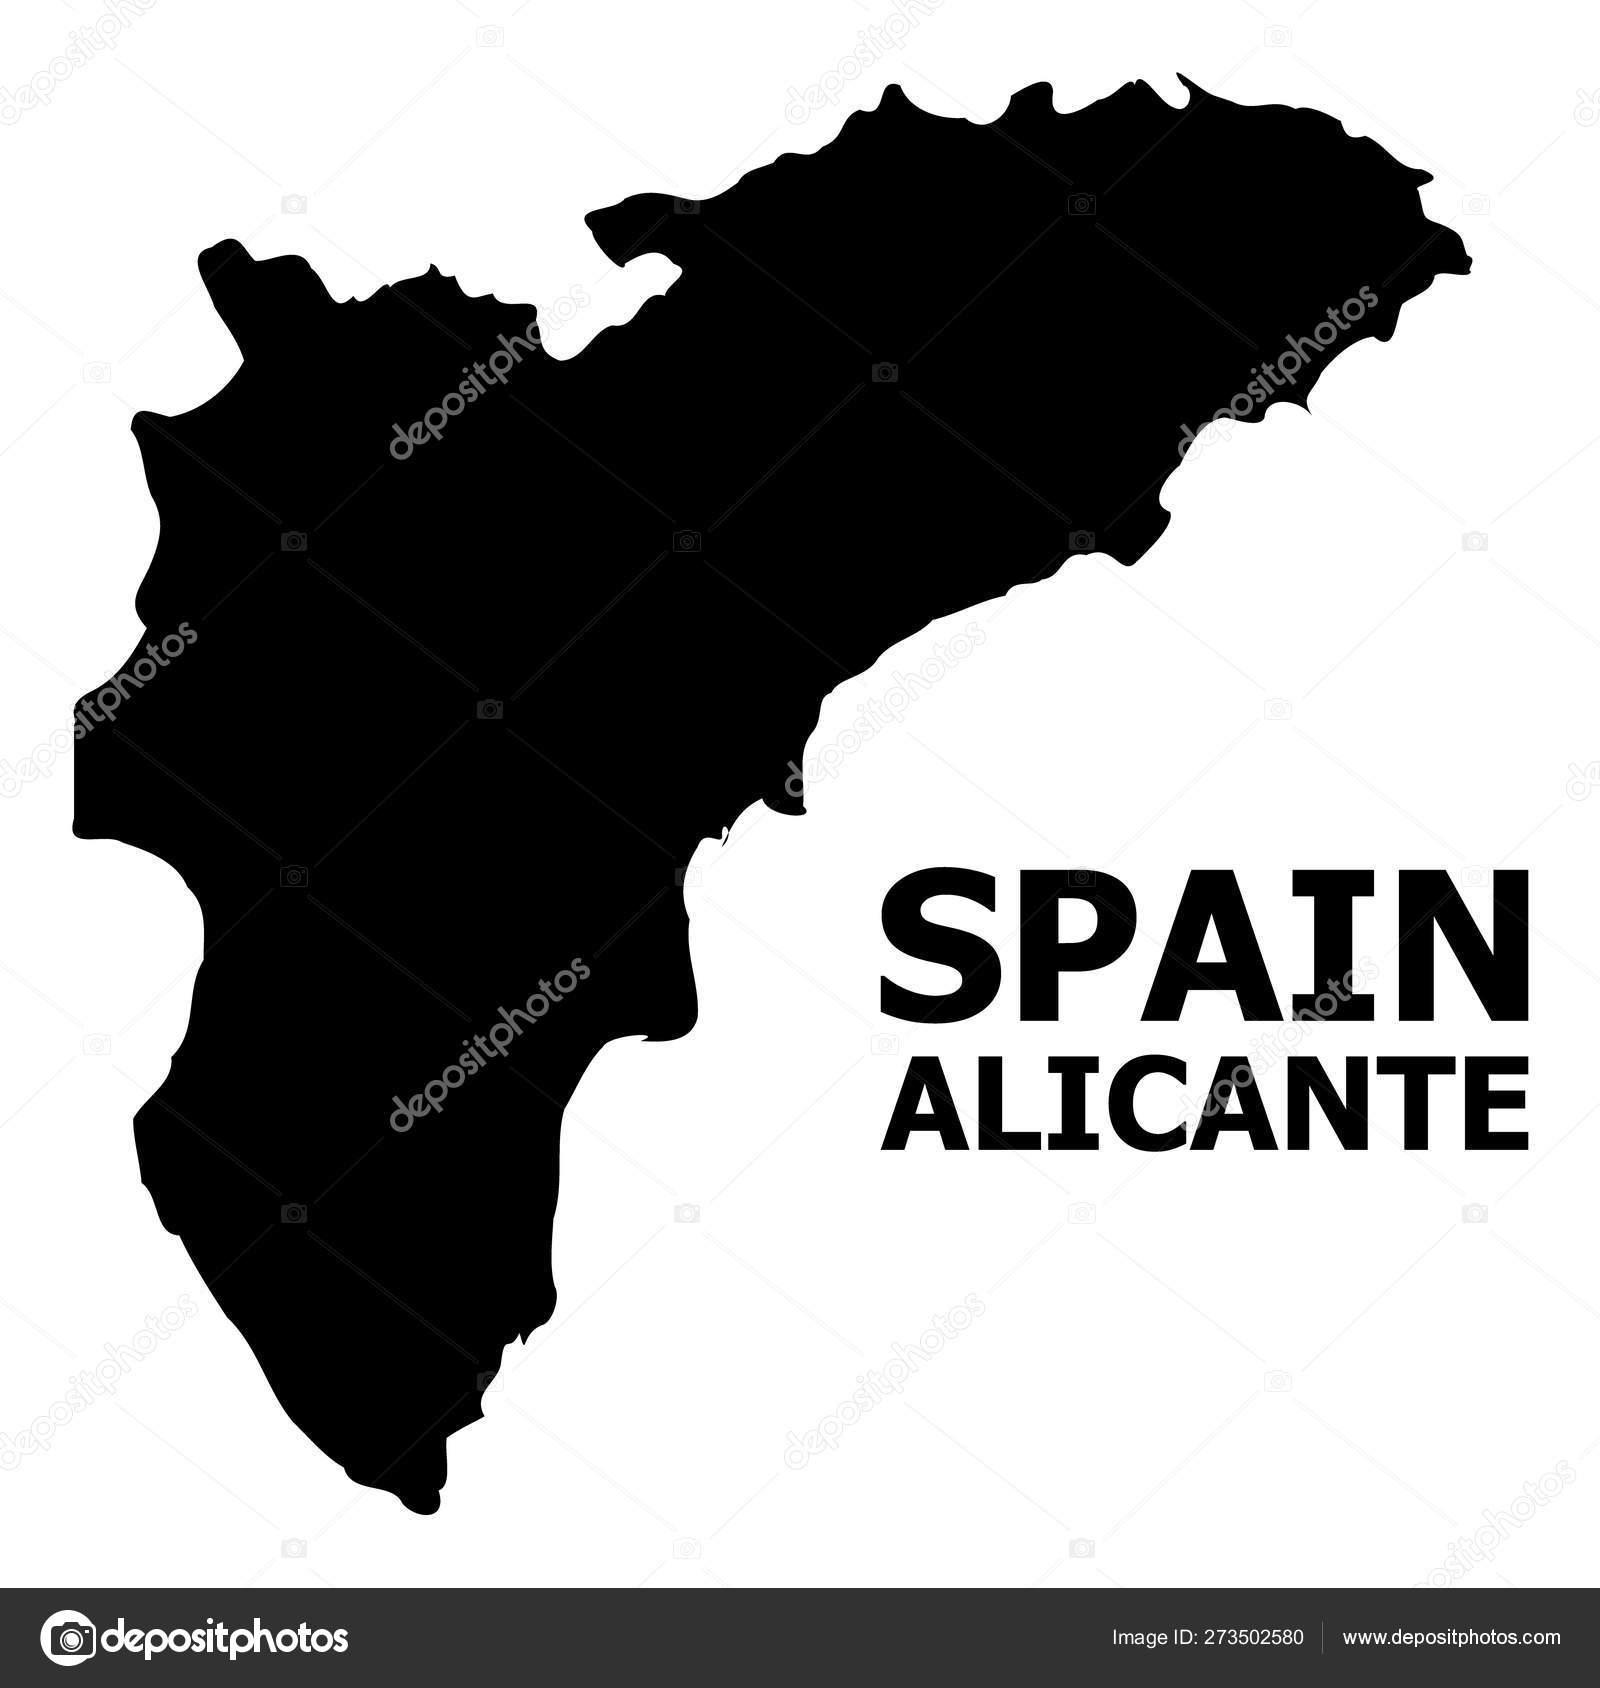 Mapa Provincia De Alicante.Mapa Plano Vectorial De La Provincia De Alicante Con